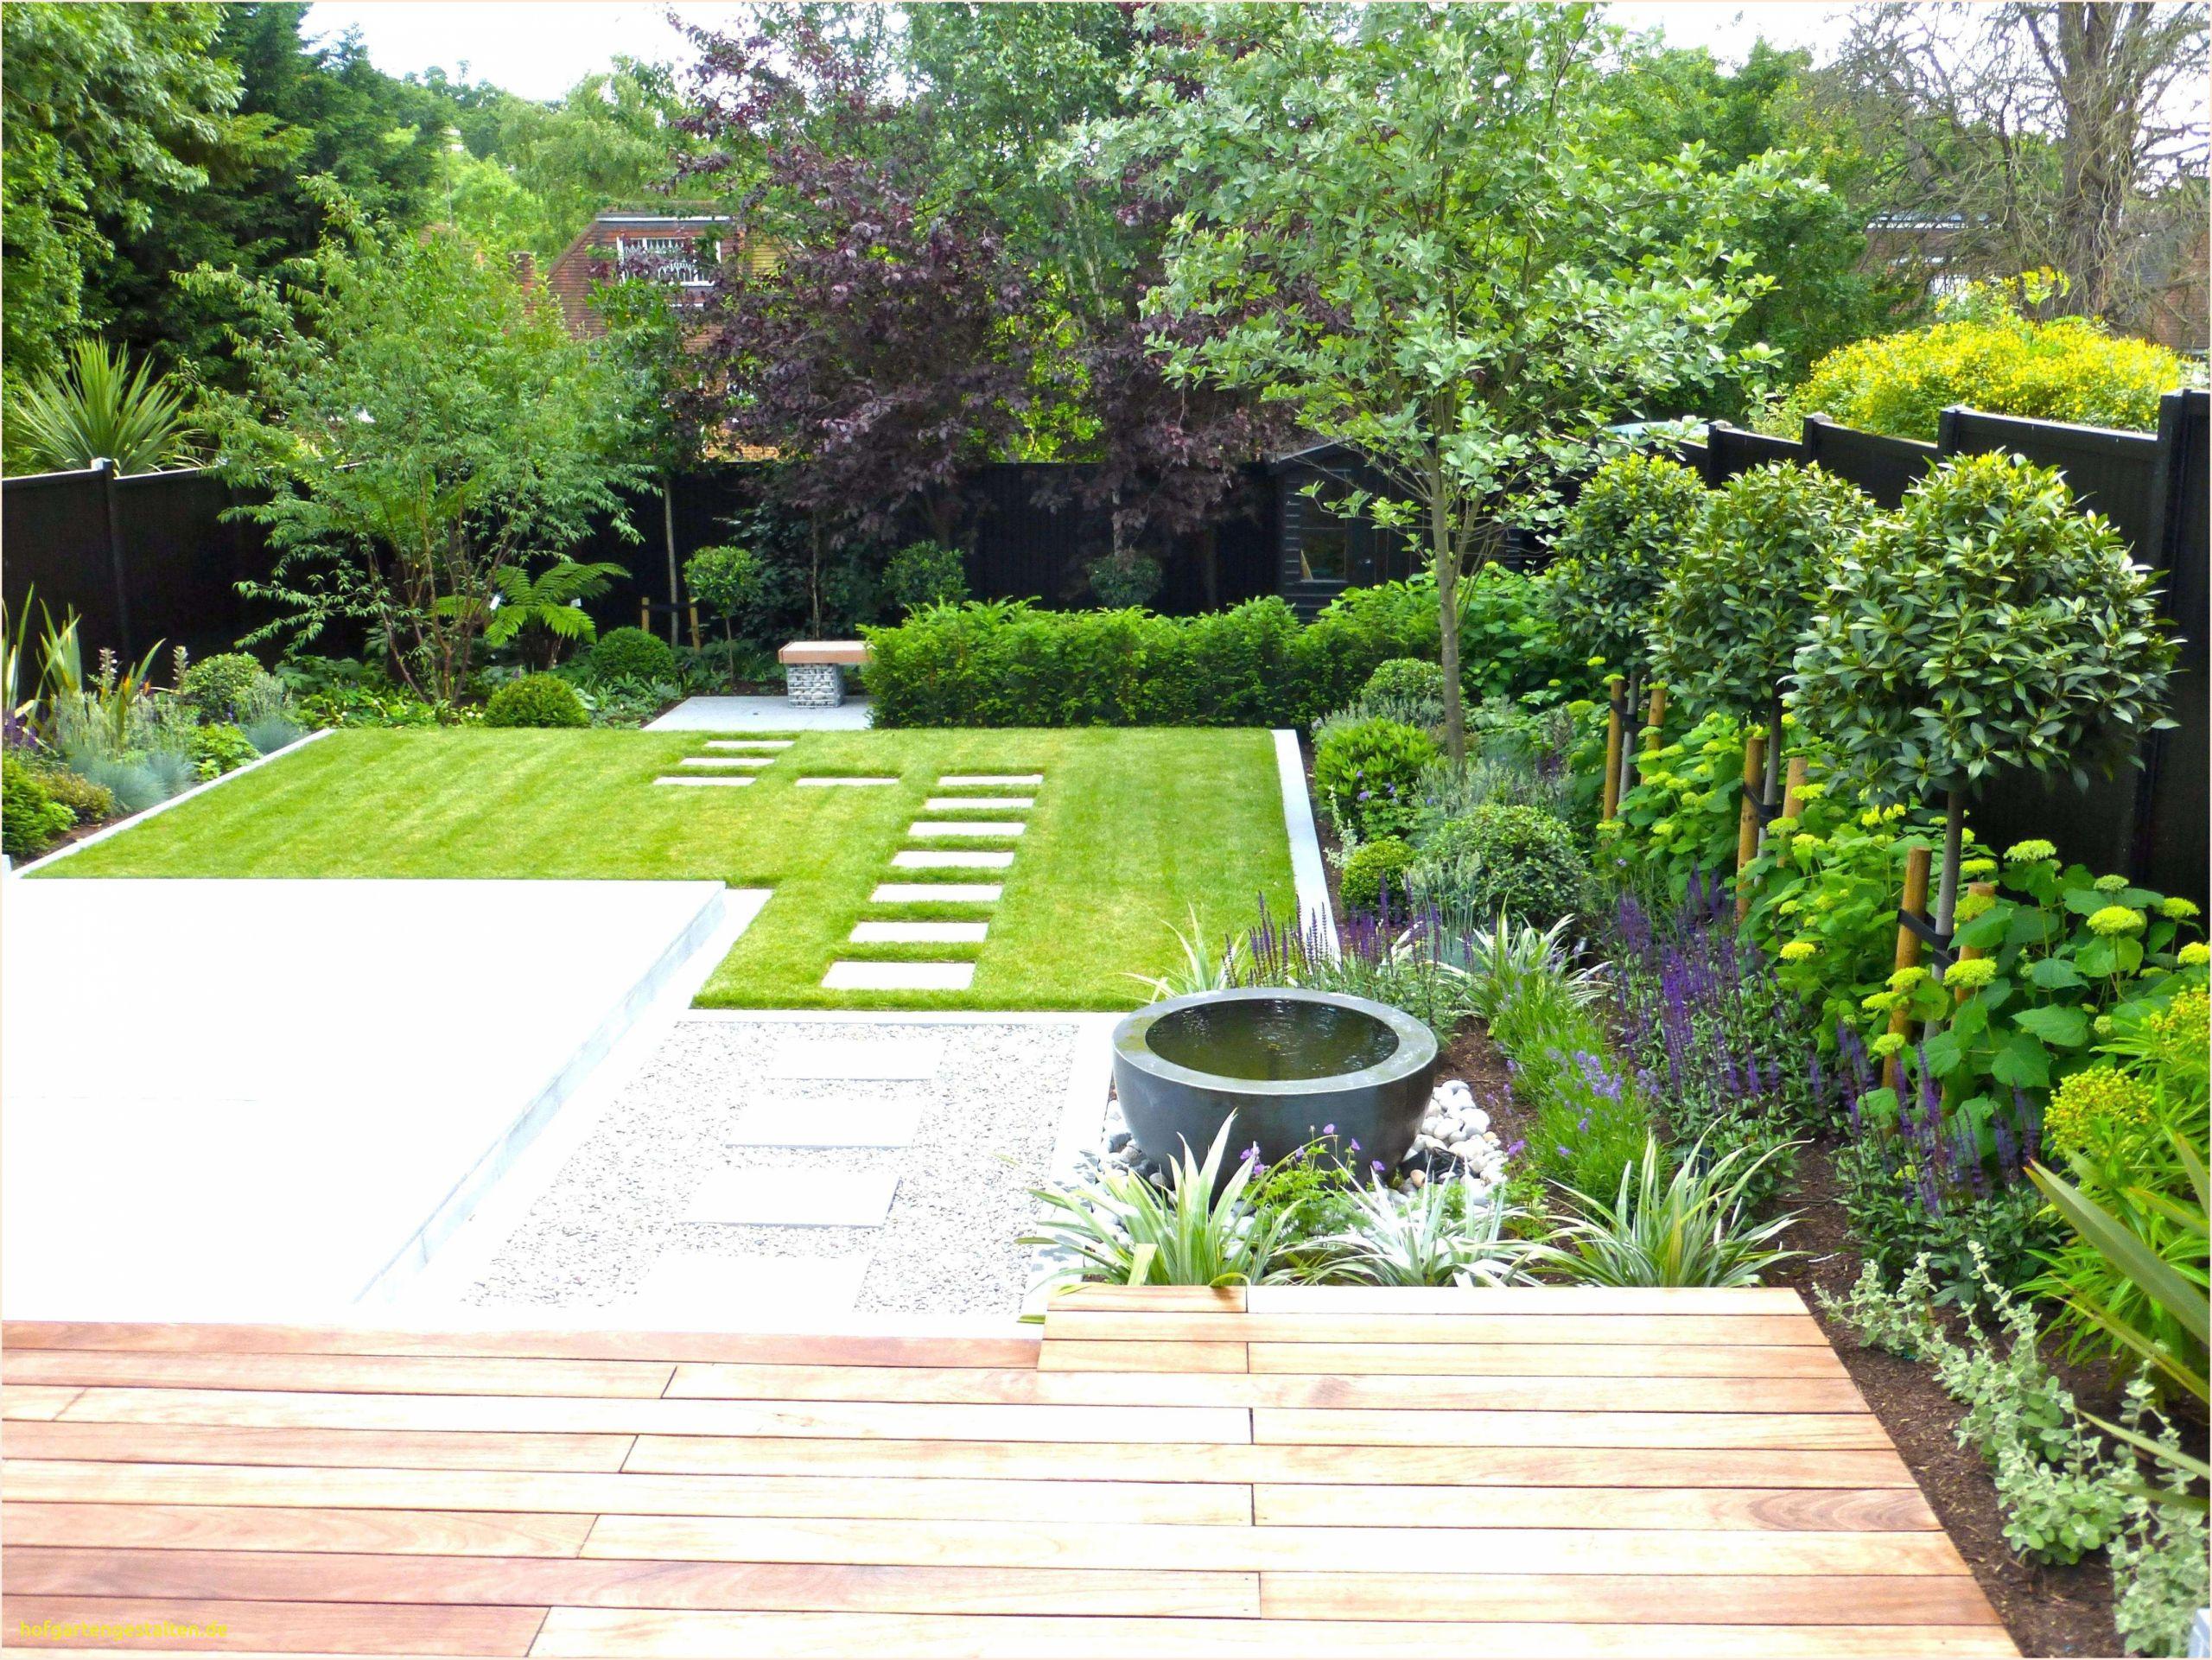 Gartendeko Ideen Selbst Gemacht Best Of Gartendeko Selbst Gemacht — Temobardz Home Blog